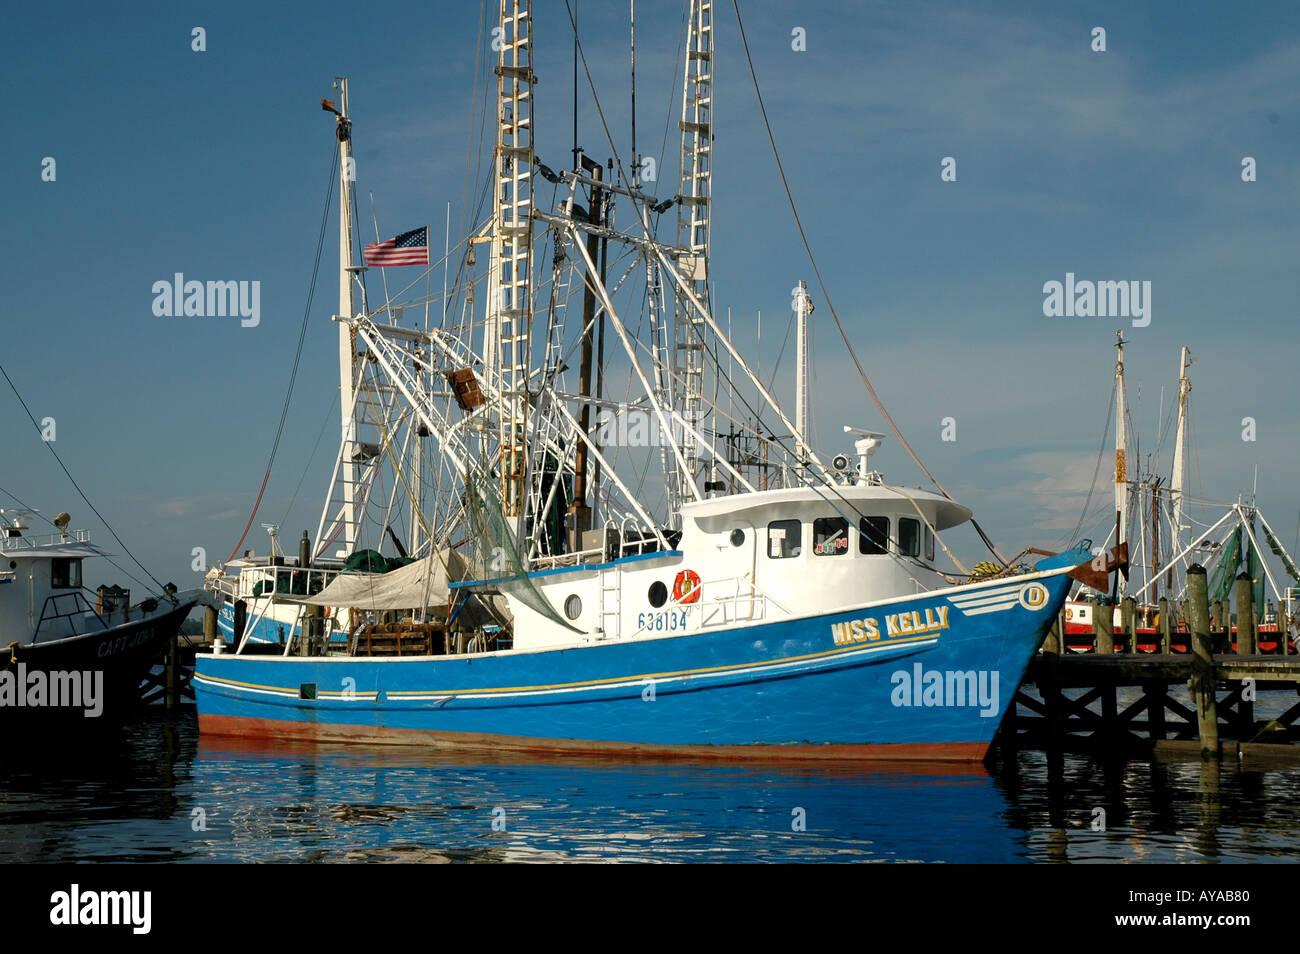 Biloxi MS Mississippi Shrimp Trawler commercial shrimping boat - Stock Image